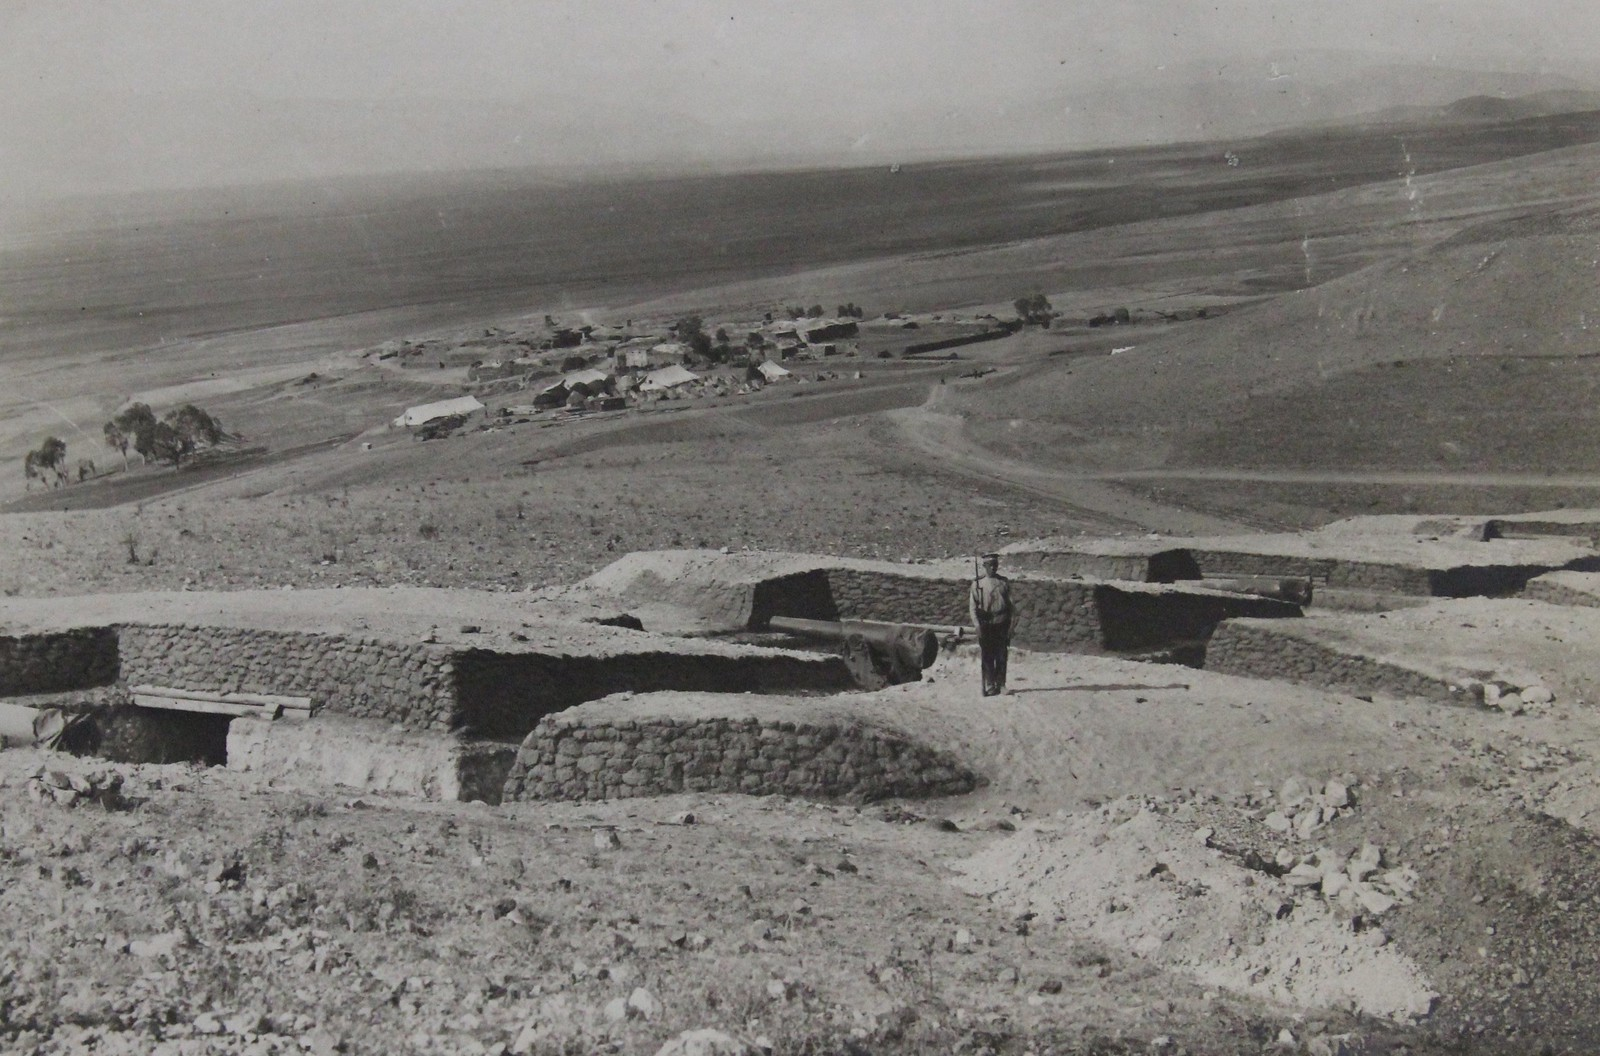 Вид на тяжёлую крепостную батарею на четыре 6-дюймовые пушки в 120 (или в 190) пудов образца 1877 г. на фоне деревни Тапакей